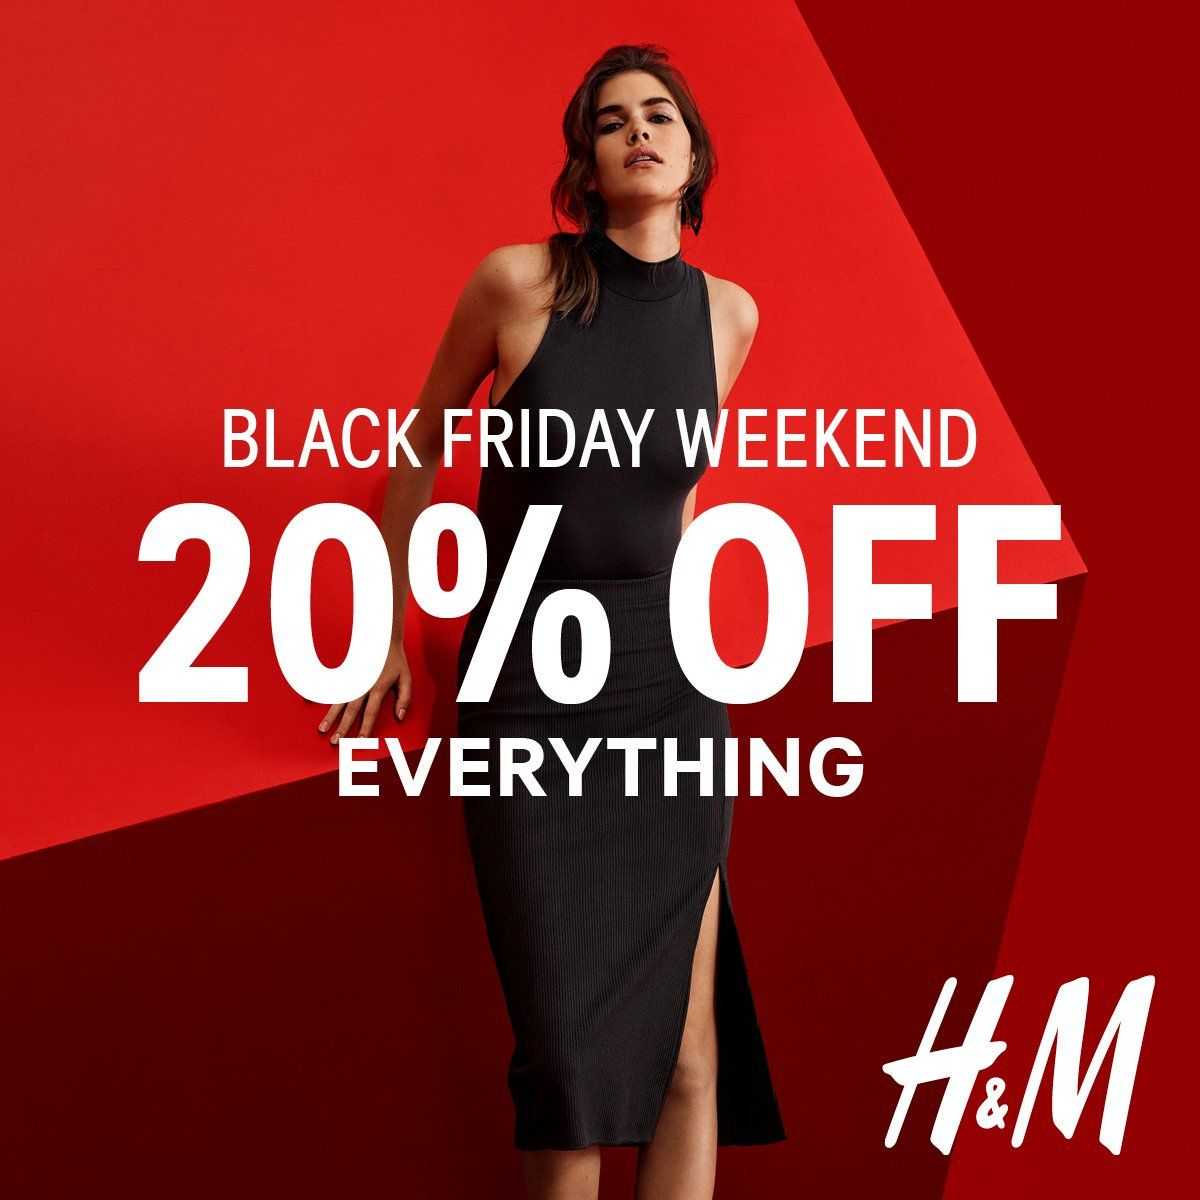 H M Black Friday Deals 2020 H M Sale Best Offers Discount Black Friday Retail Black Friday Weekend Black Friday Sale